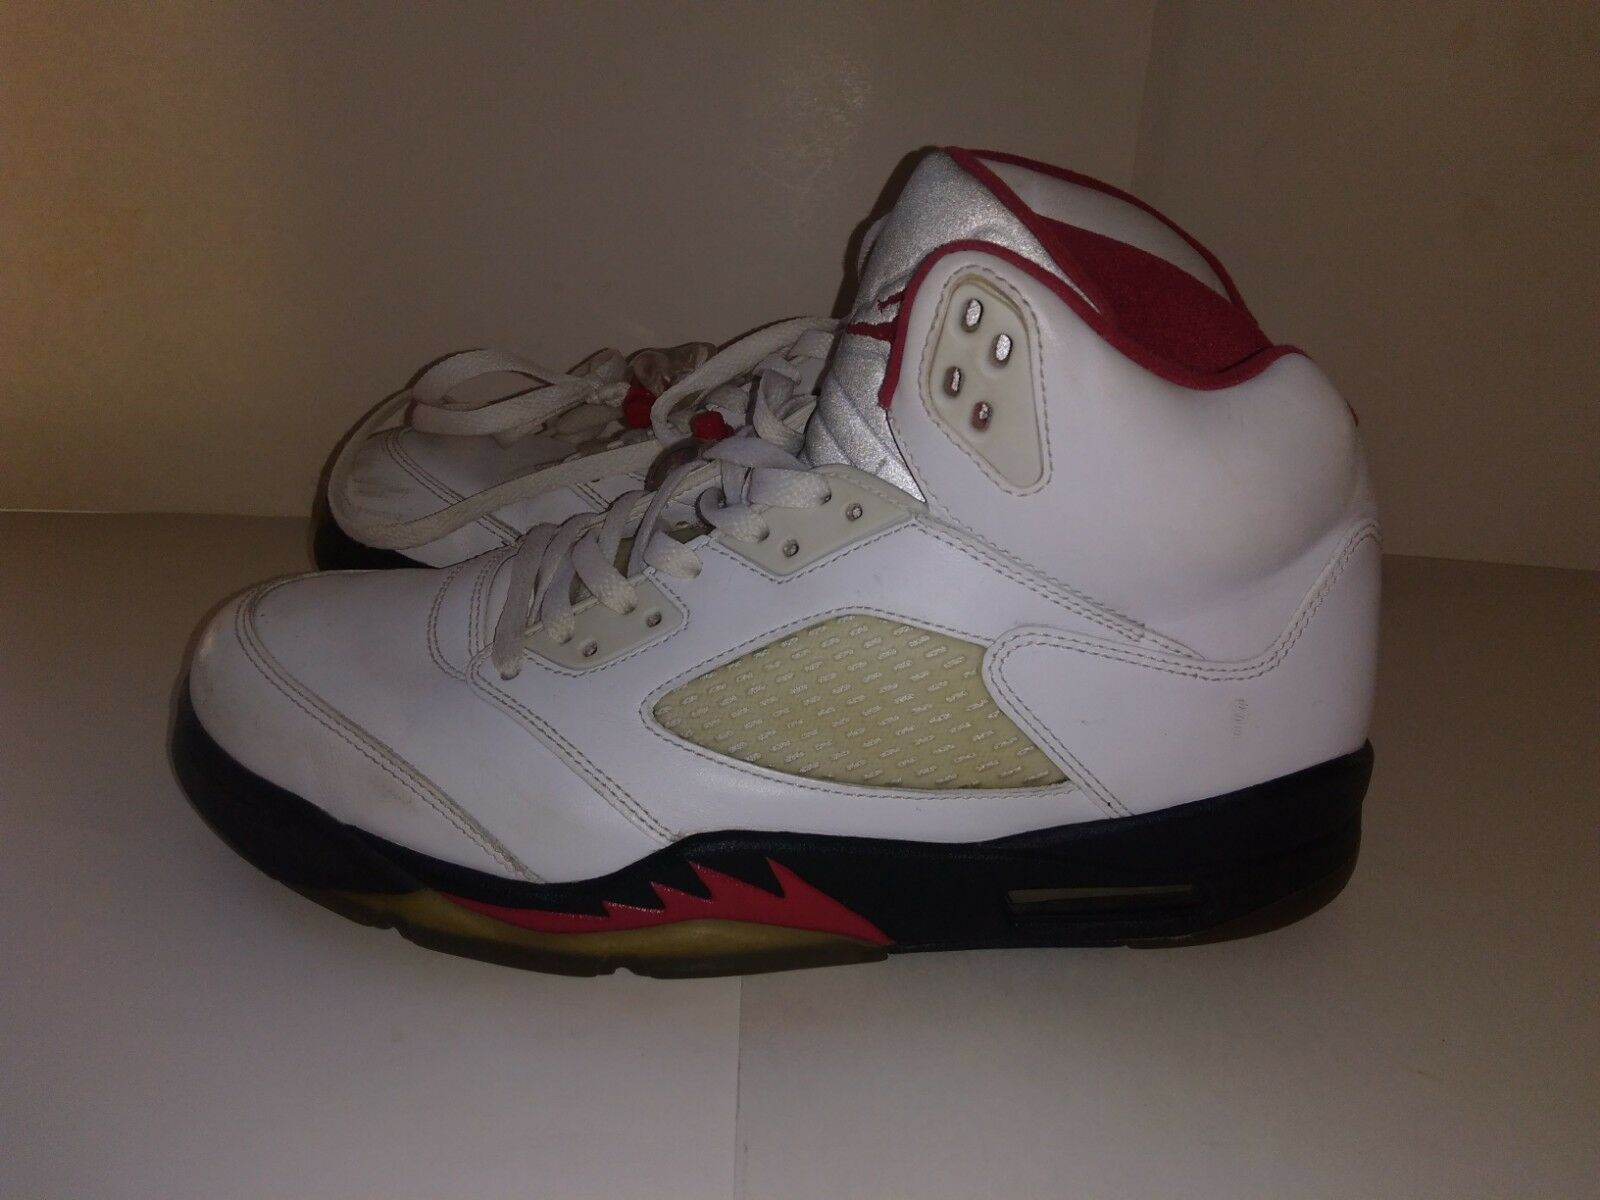 Nike v air jordan v Nike retro - rot - weiße größe 10,5 889b4e